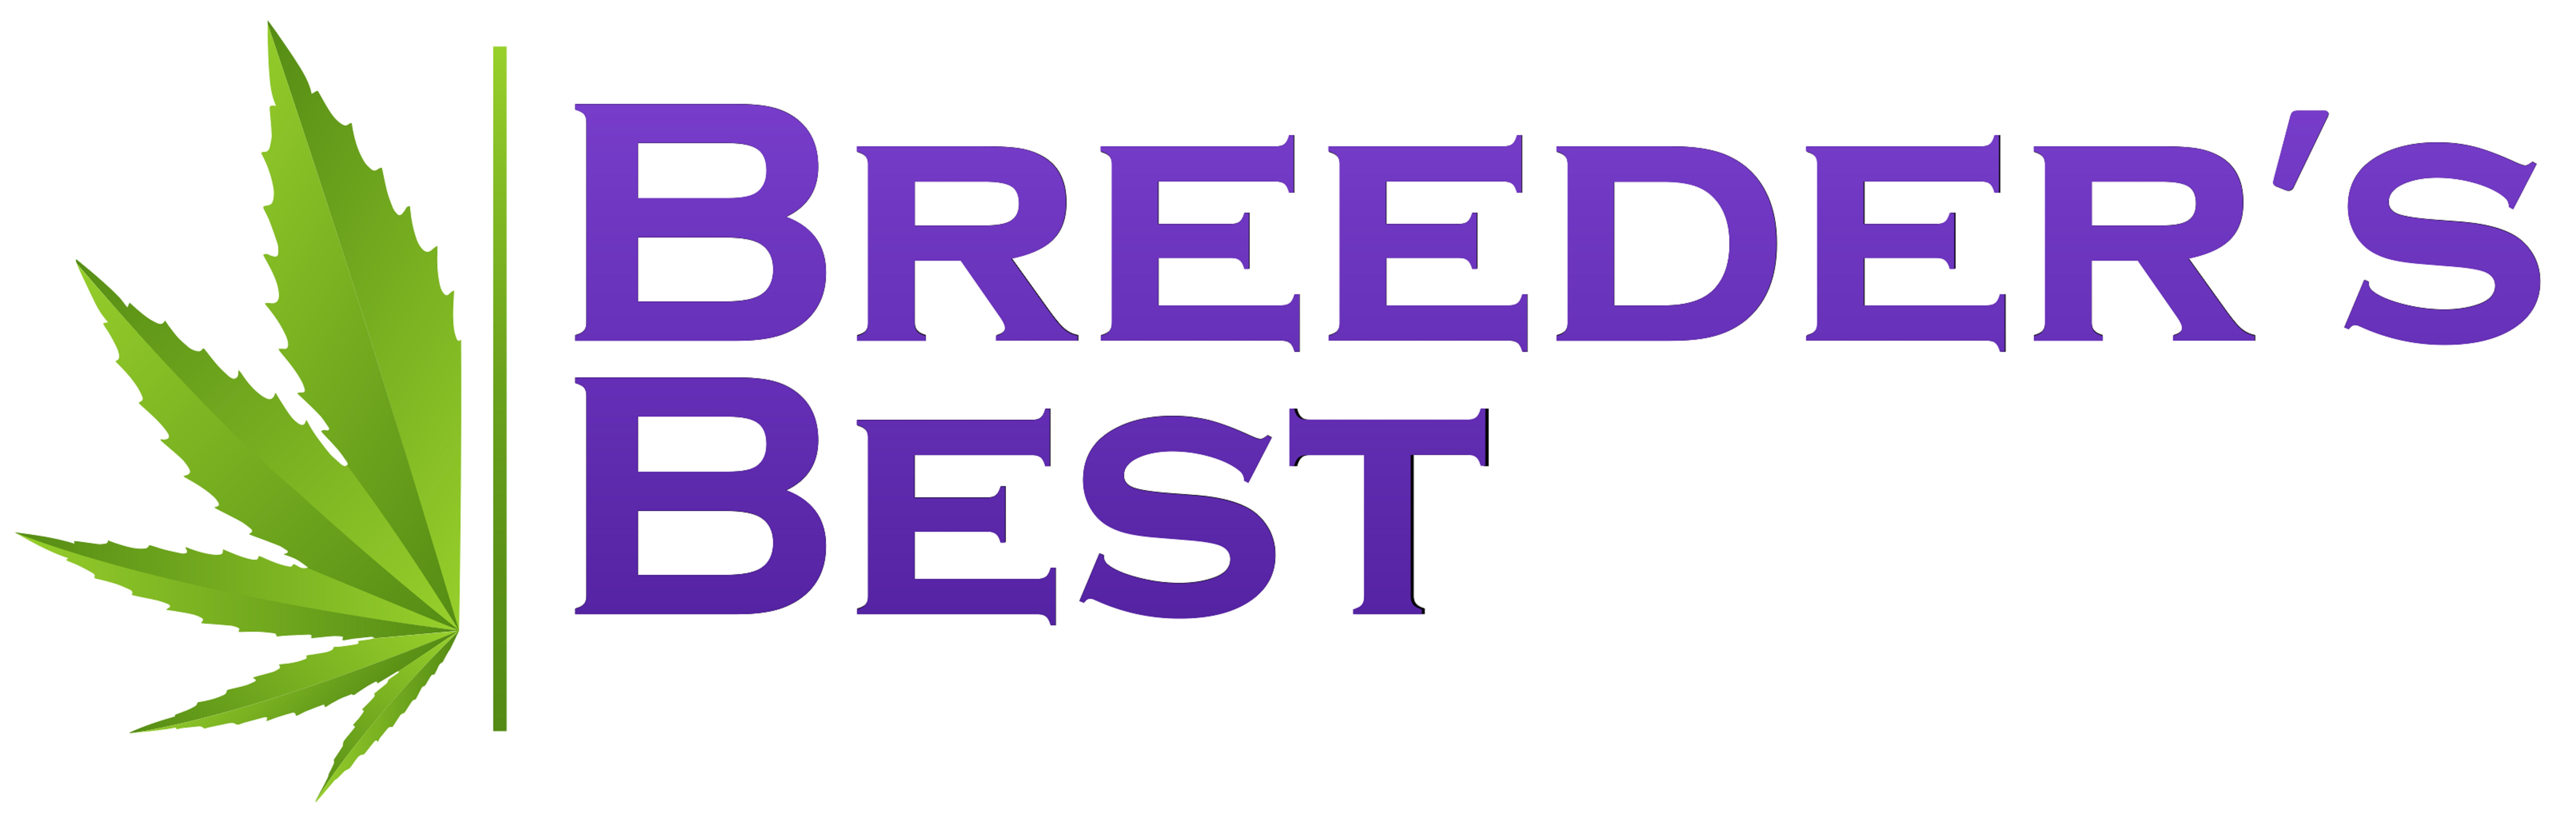 Breeders-best-logo